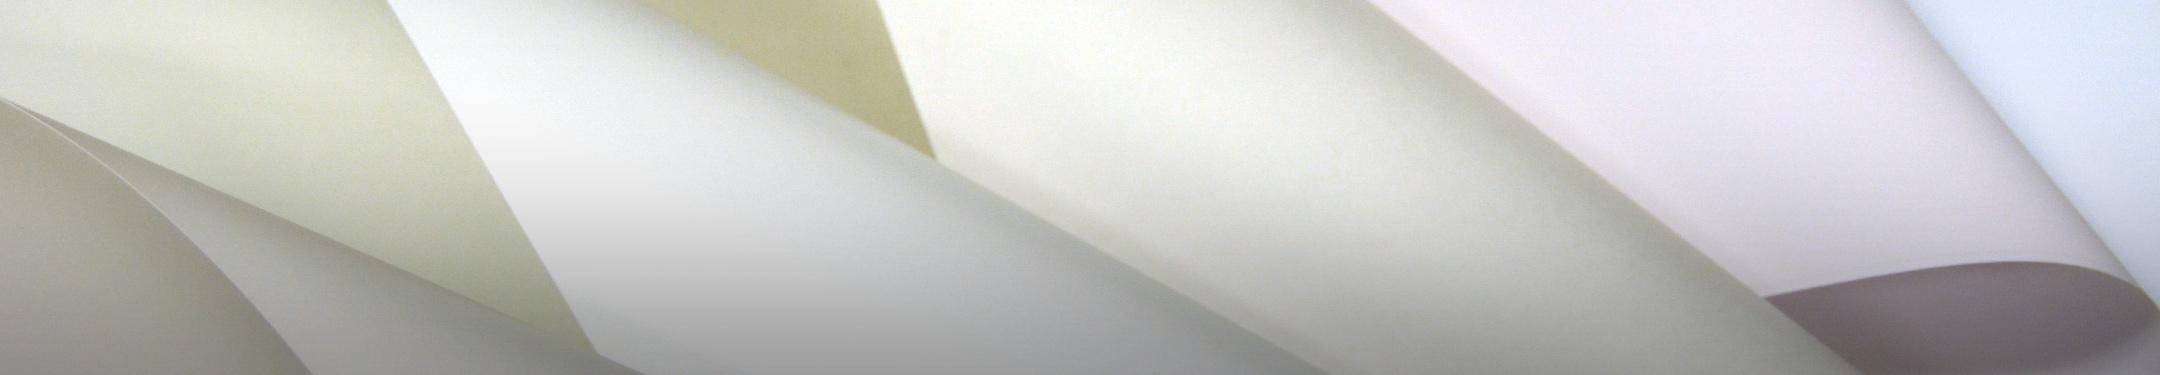 NCR Paper* Brand Specialties